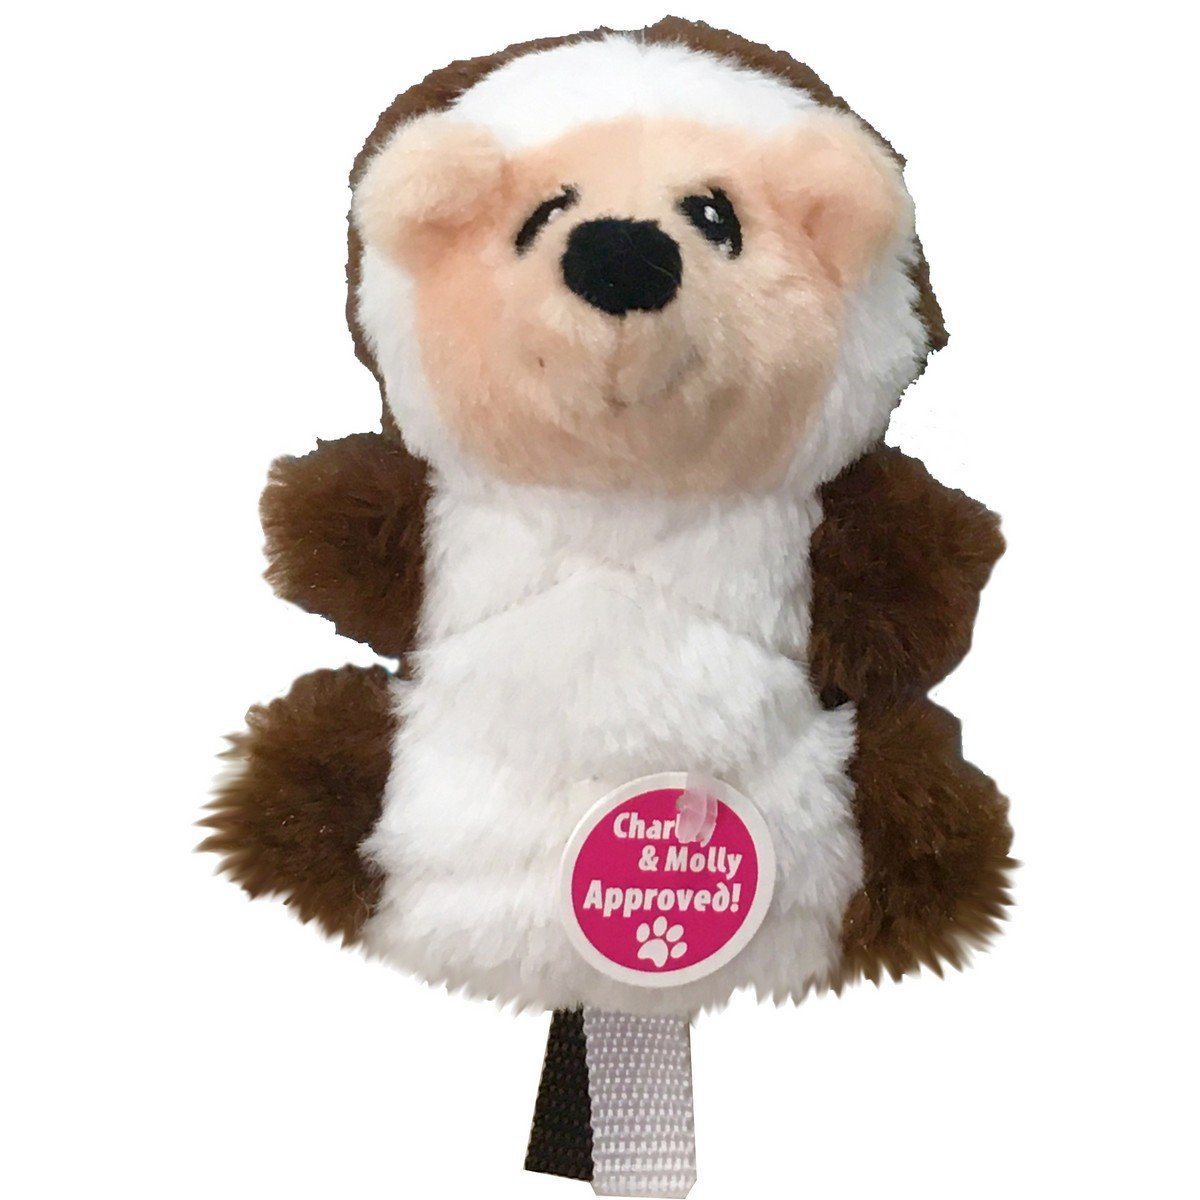 Afbeelding van Charley & Molley Comfort Plush Hedgehog 12cm